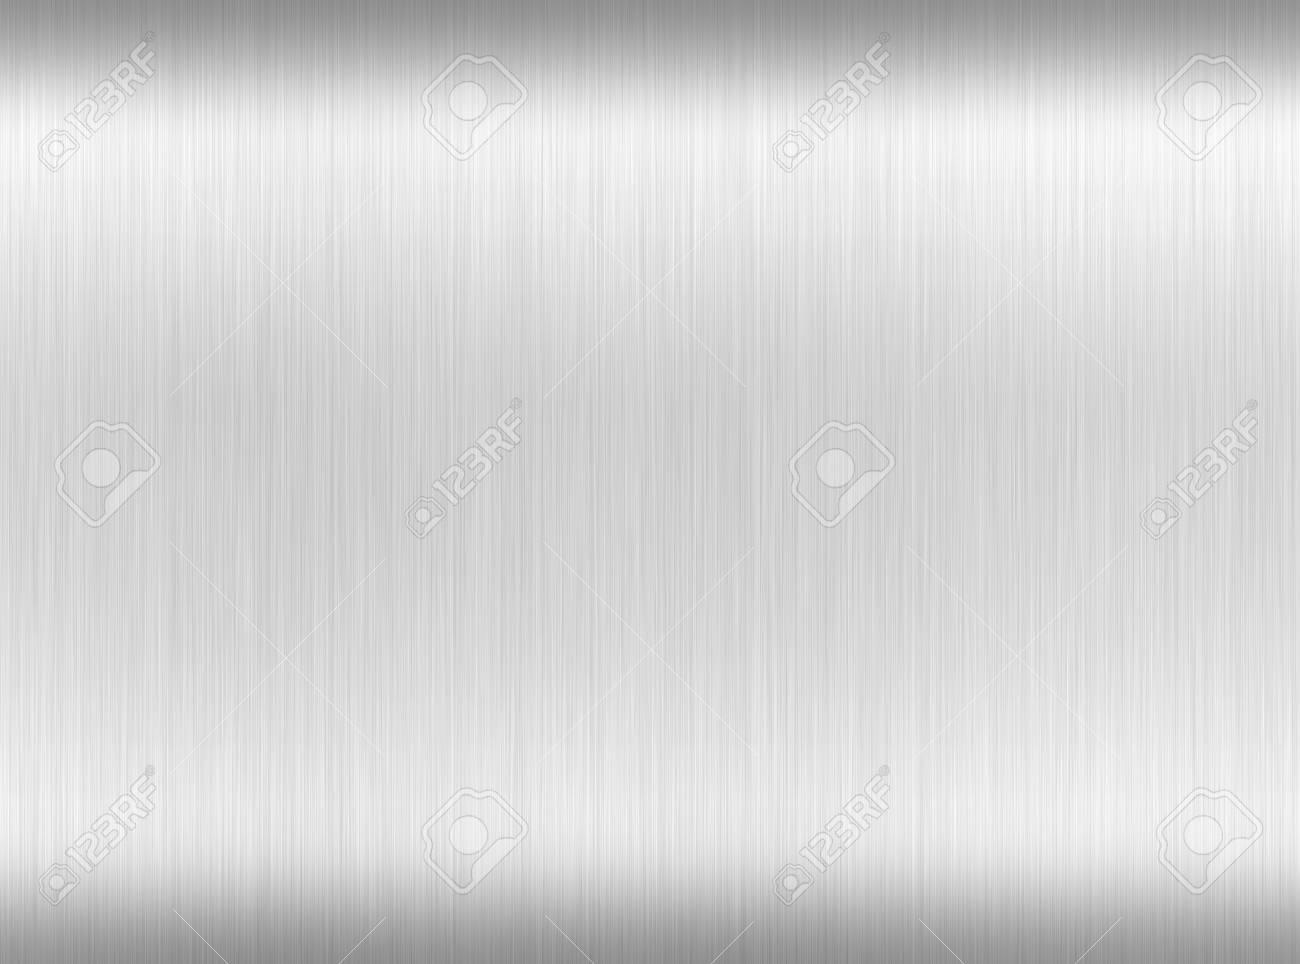 metal background Stock Photo - 14651052